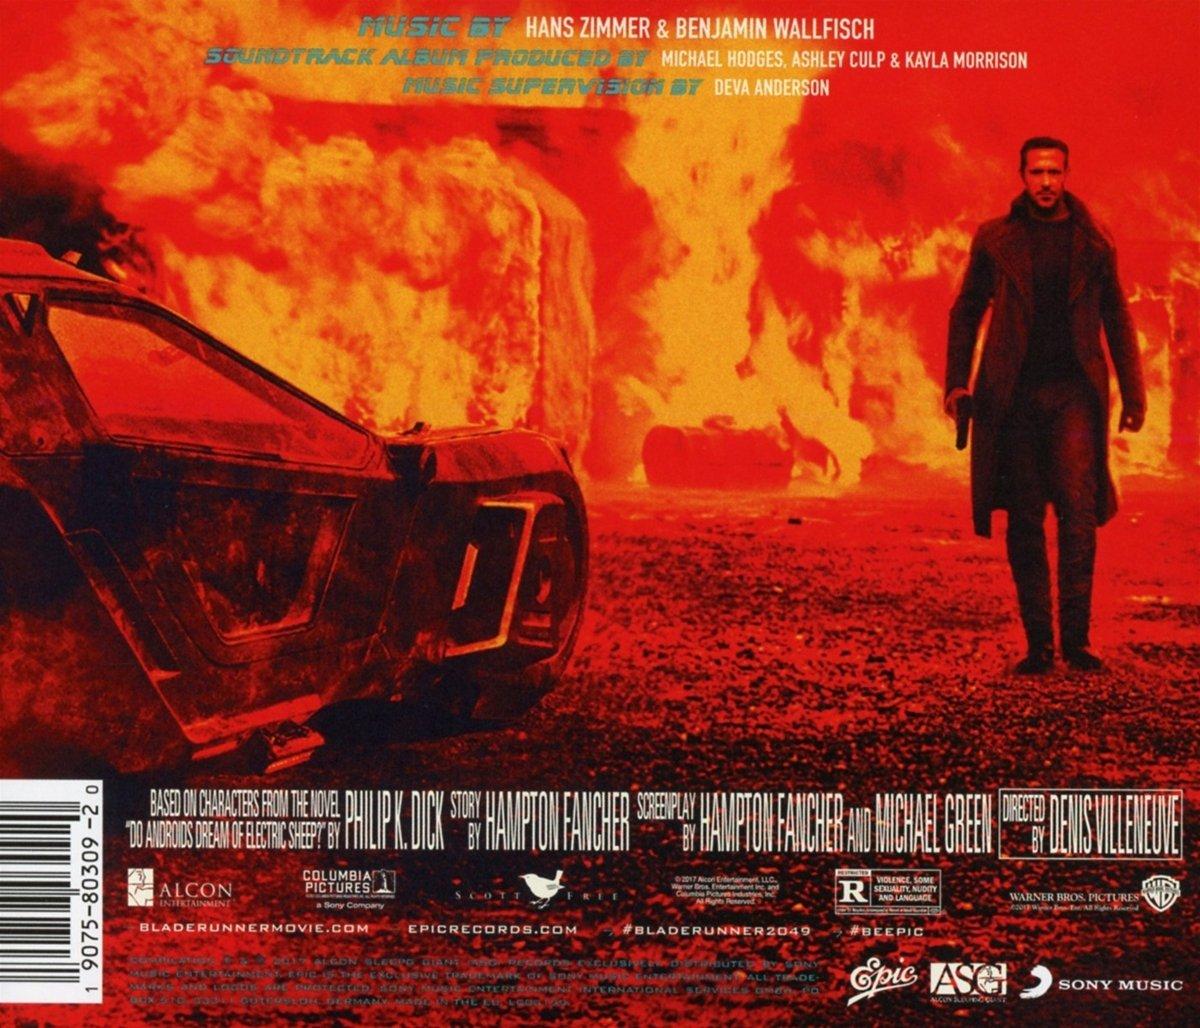 Hans Zimmer Benjamin Wallfisch Blade Runner 2049 Original Motion Picture Soundtrack Amazon Com Music